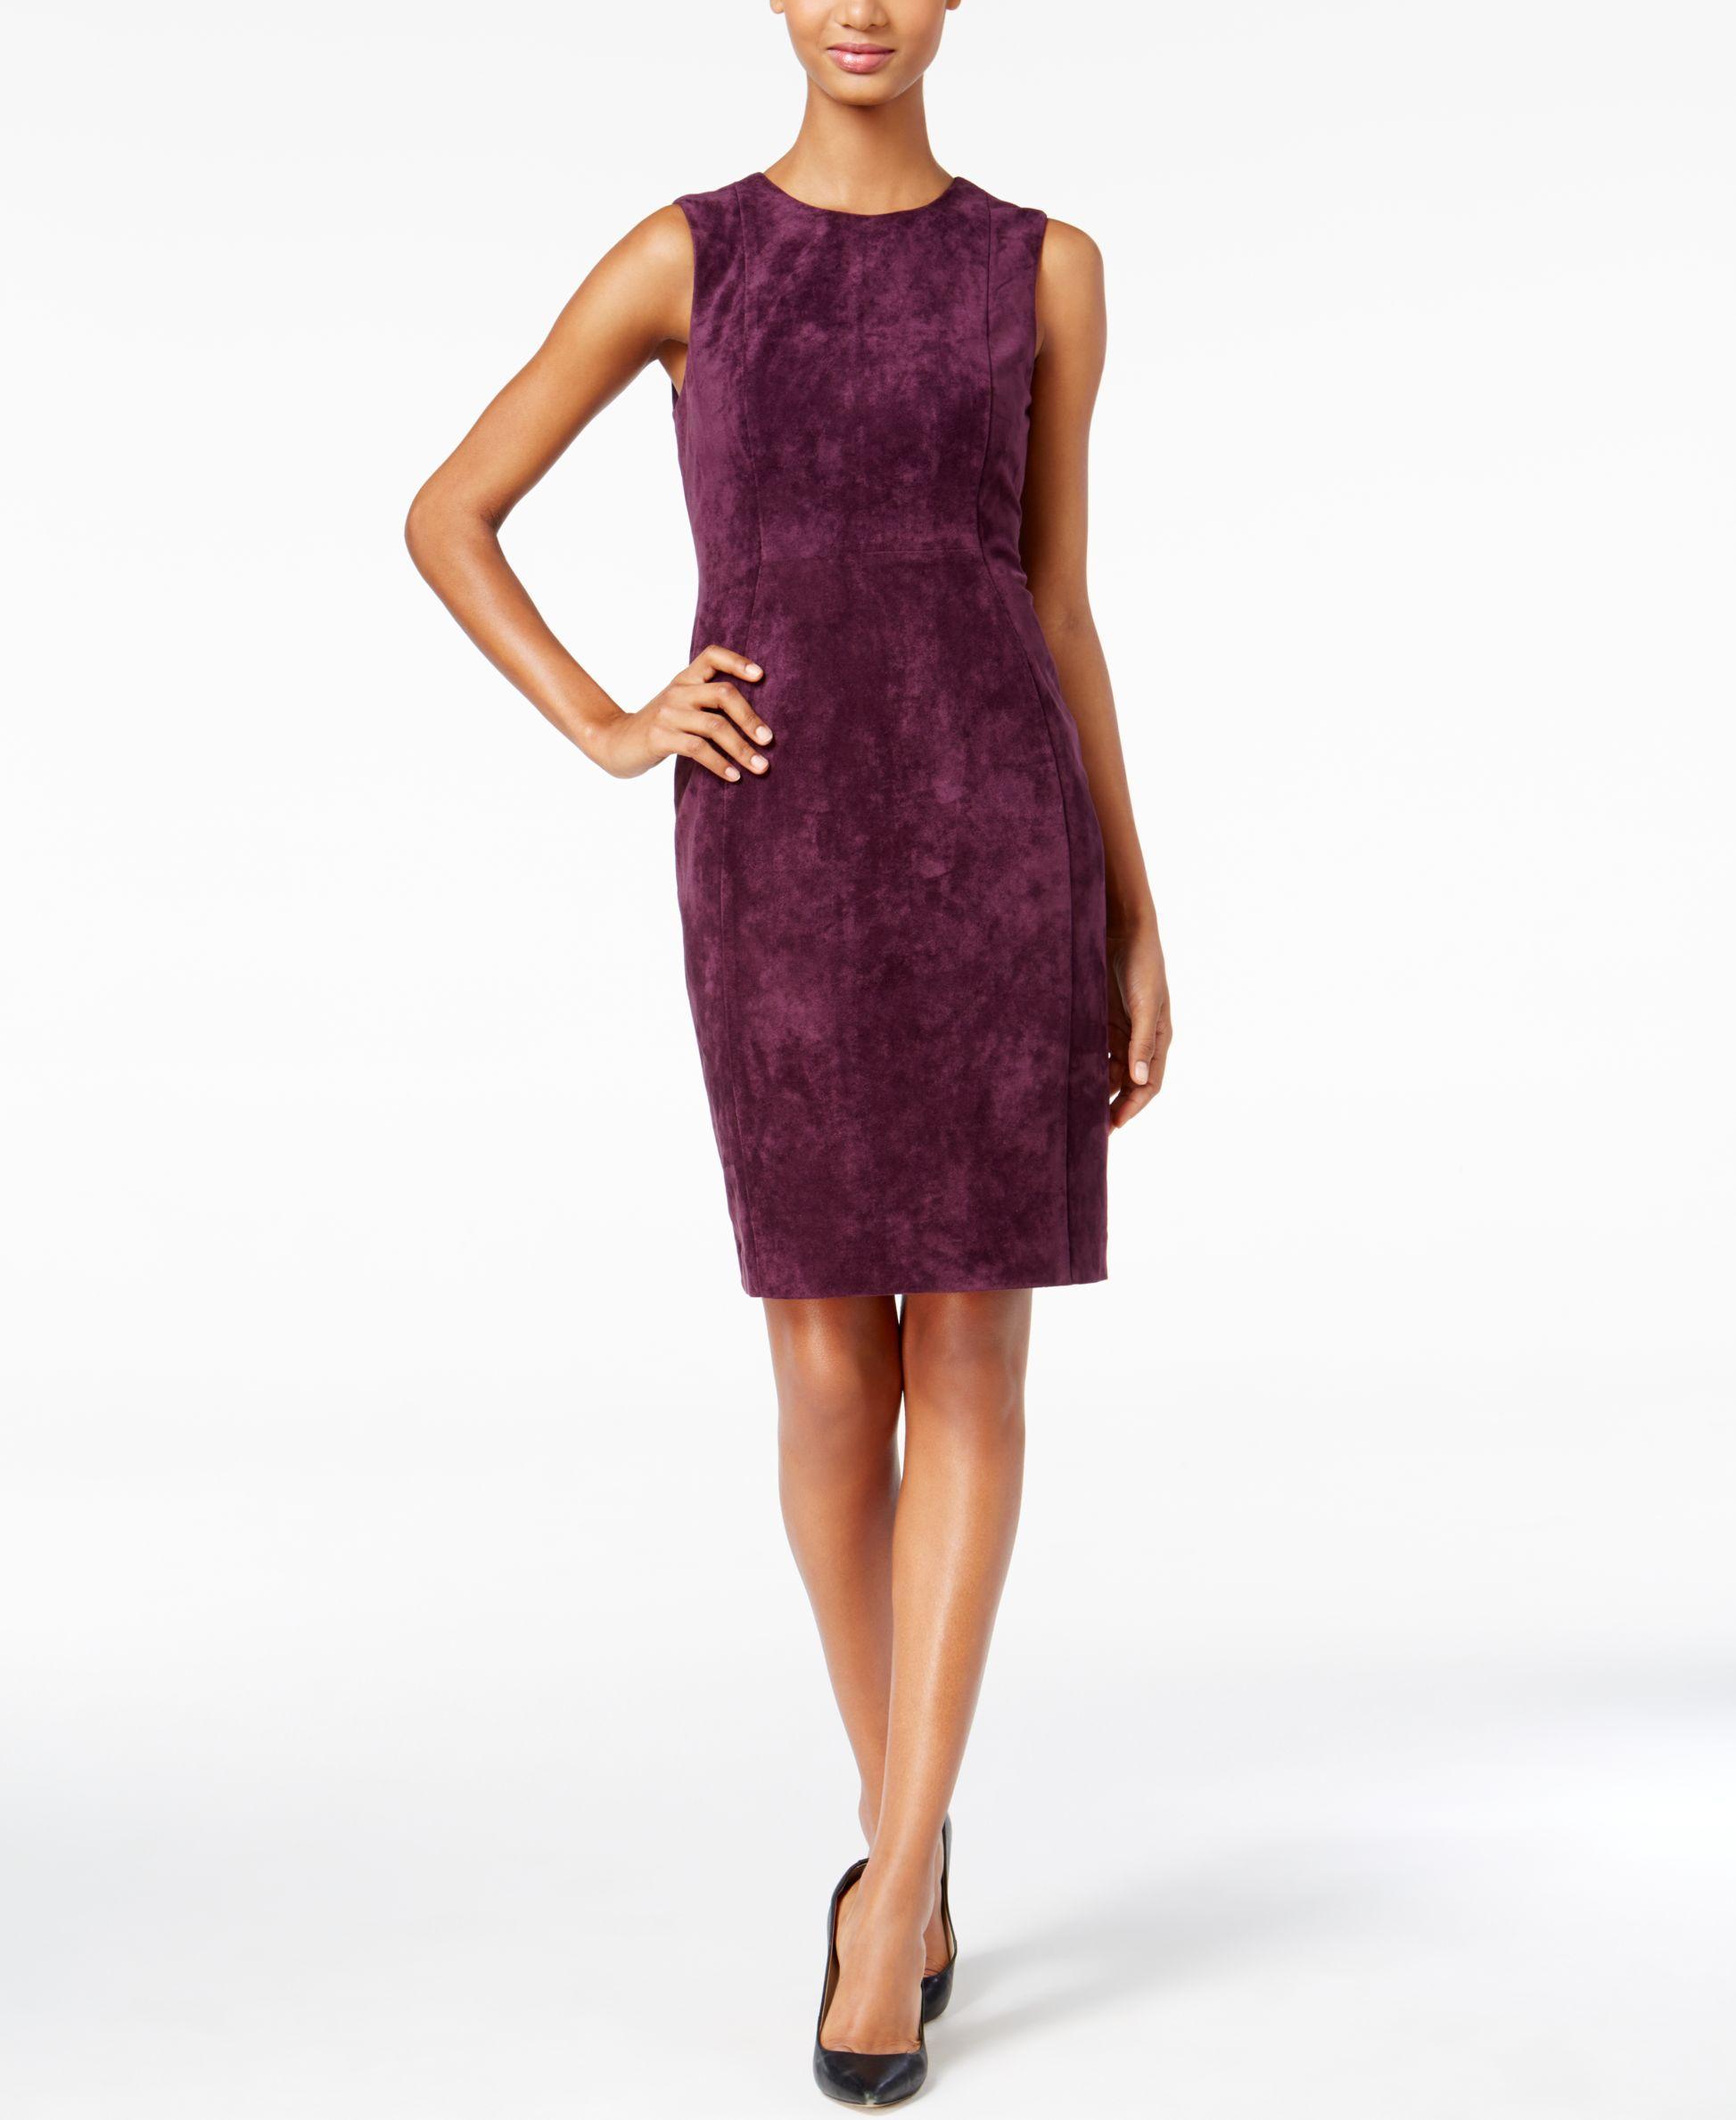 Calvin Klein Faux-Suede Sleeveless Sheath Dress